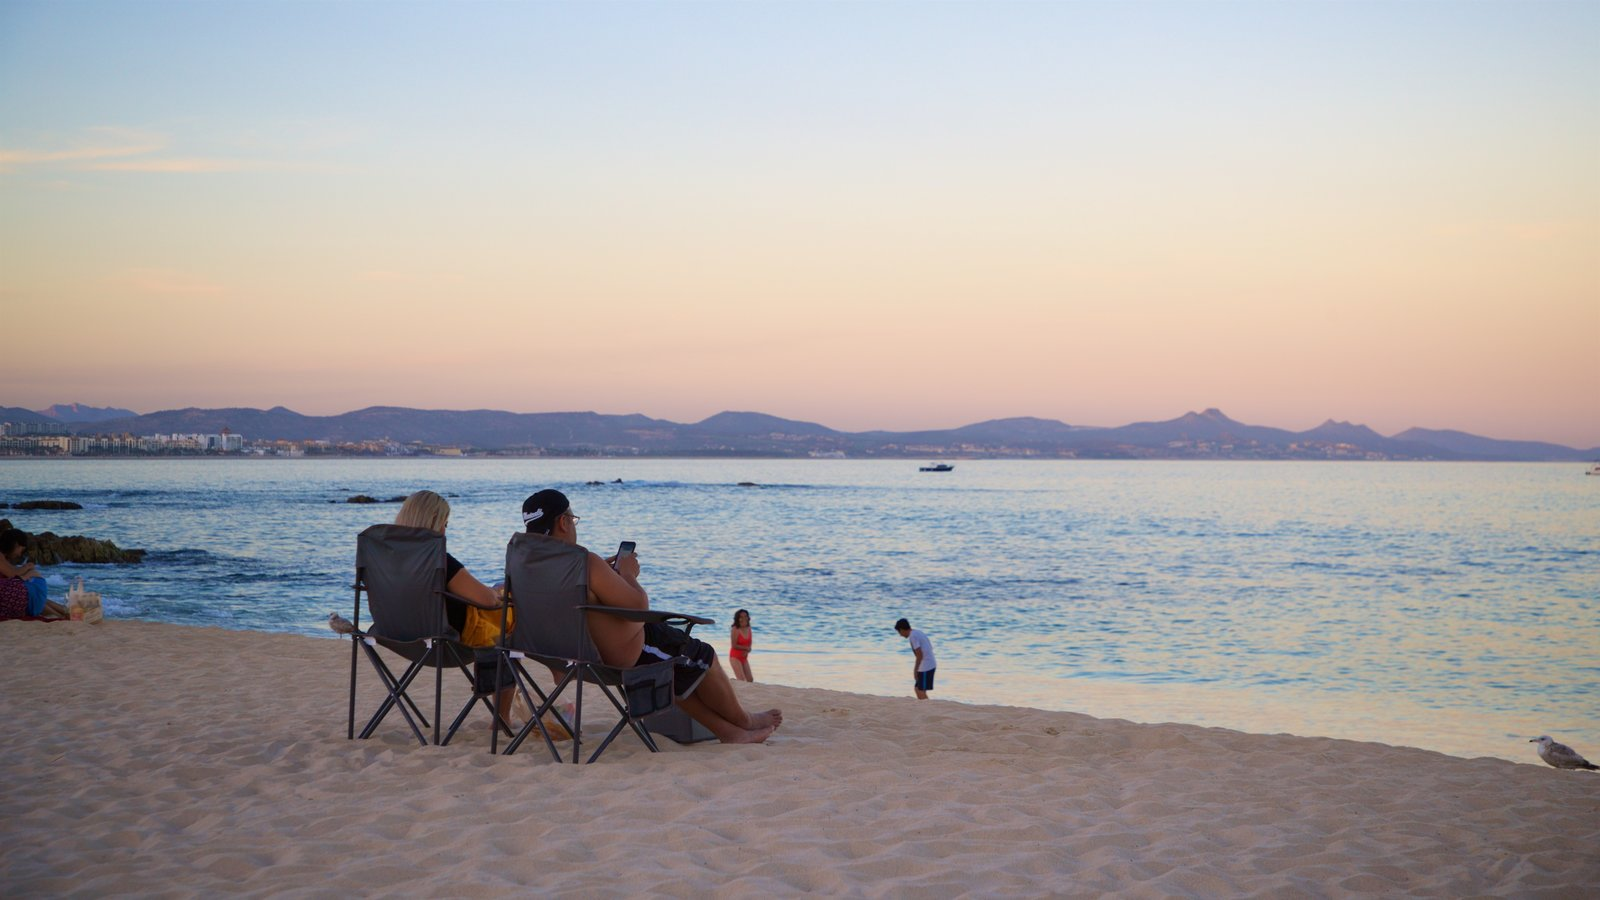 Palmilla Beach showing general coastal views, a beach and a sunset